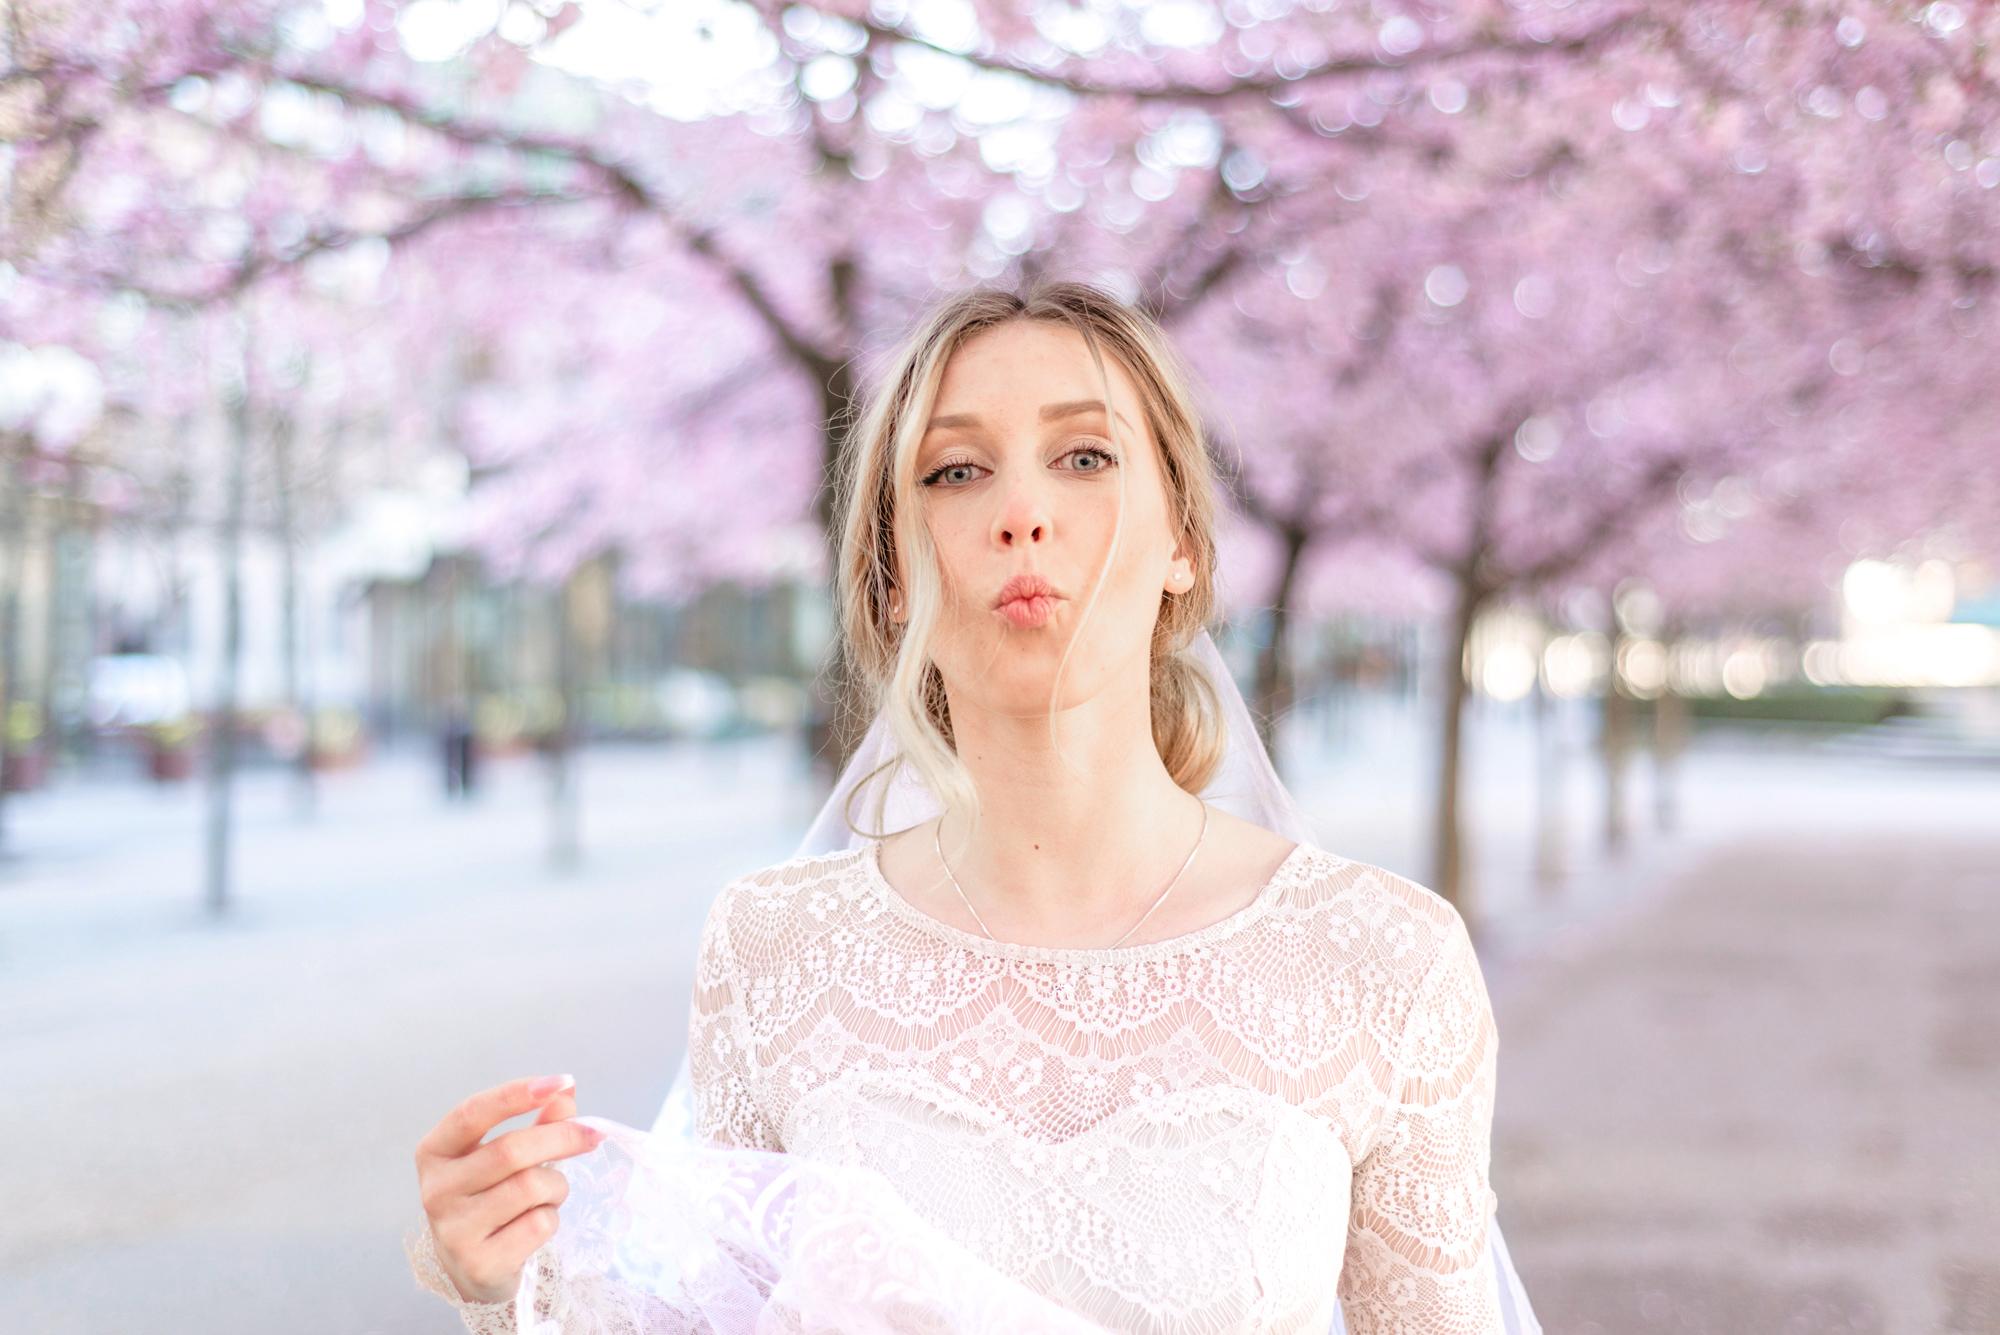 Bridal Inspiration in Cherry Blossom